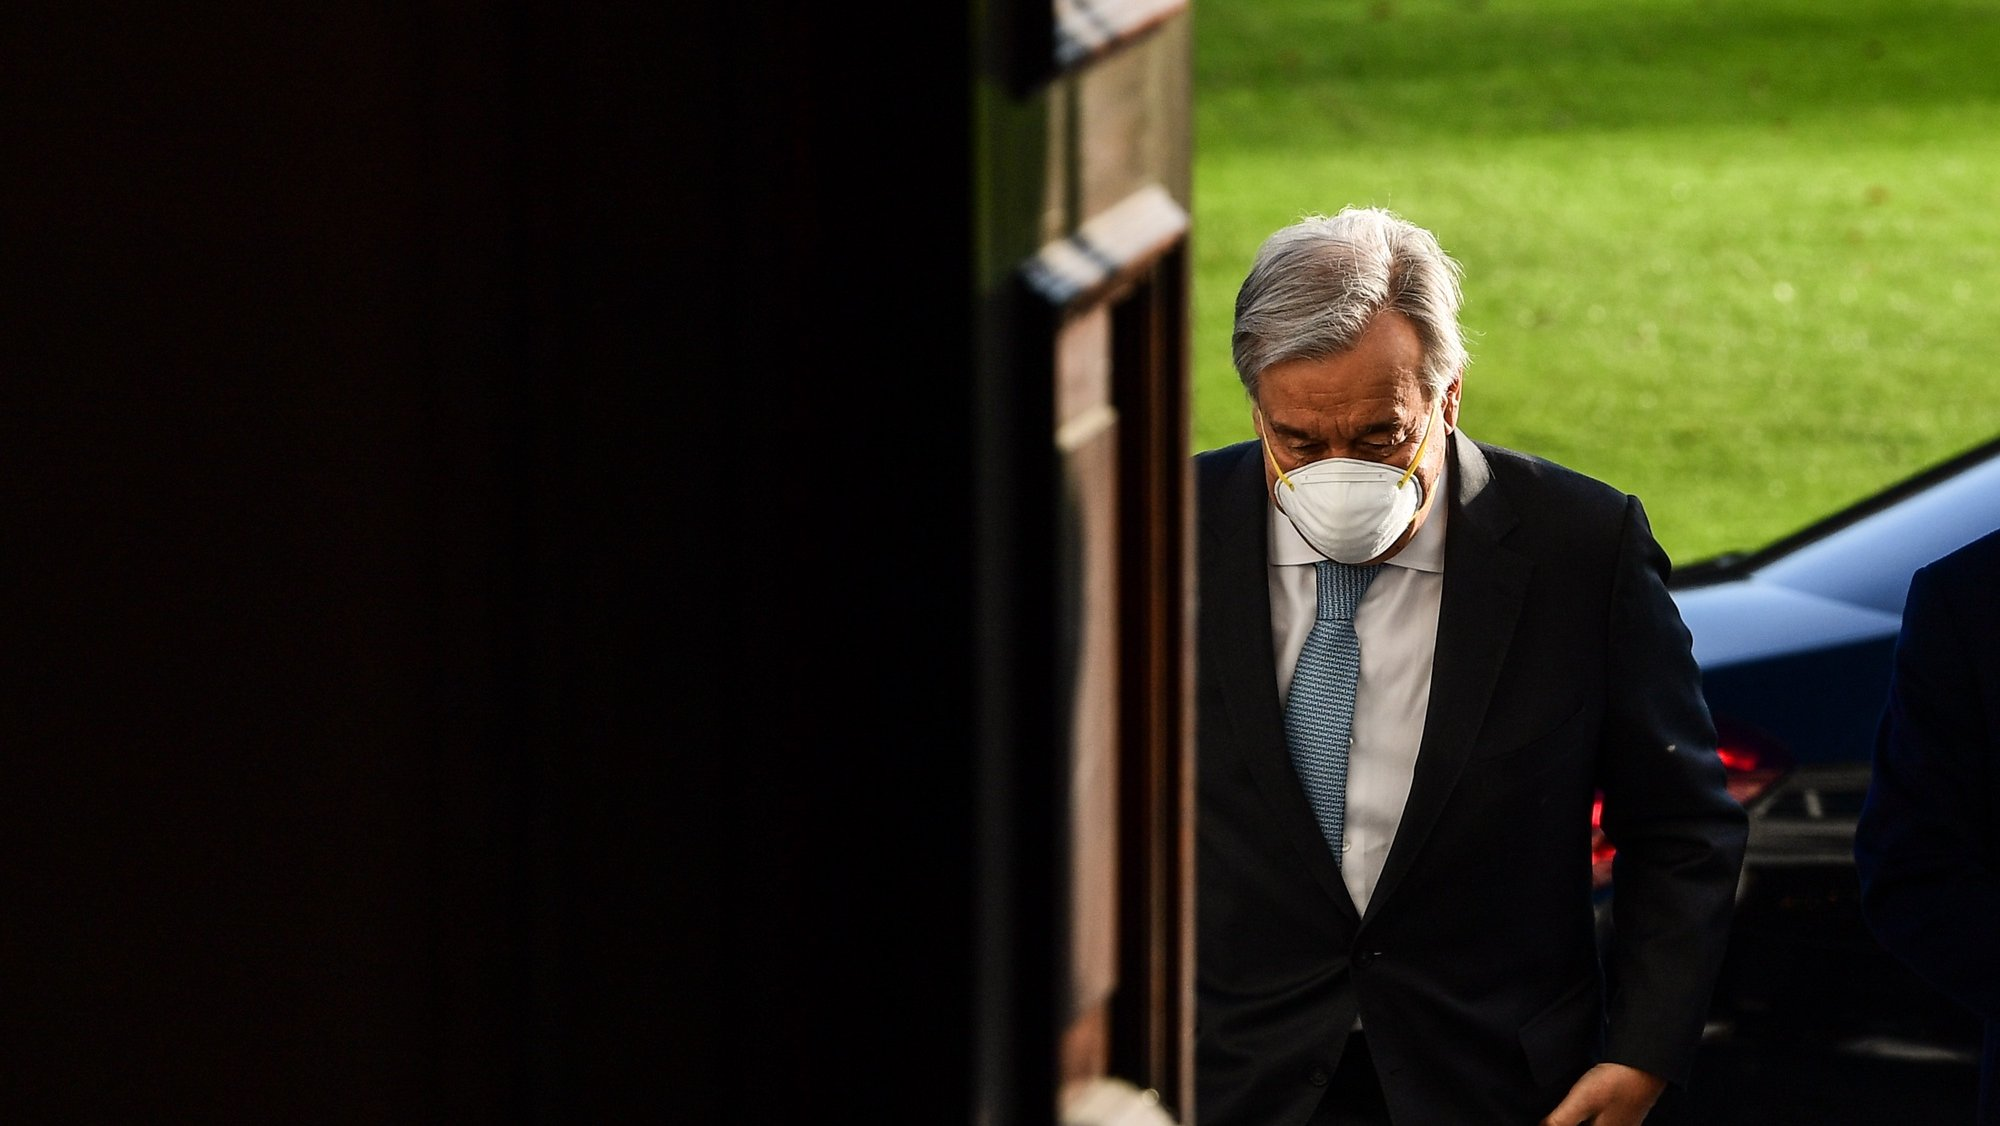 epa08891637 UN Secretary-General Antonio Guterres arrives for a meeting with German President Frank-Walter Steinmeier at Bellevue Palace in Berlin, Germany, 18 December 2020.  EPA/FILIP SINGER